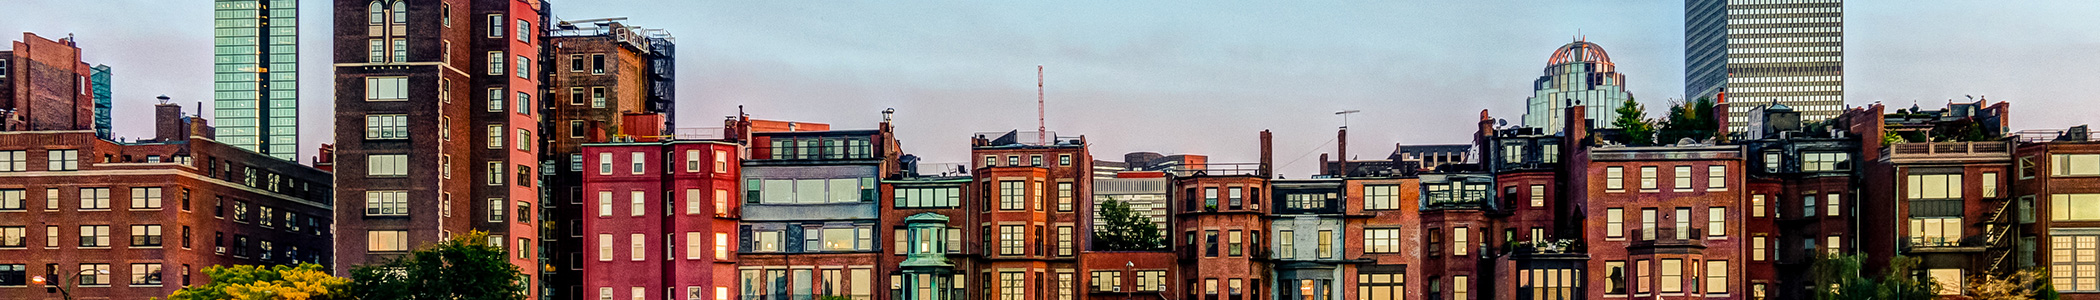 Boston/Back Bay-Beacon Hill – Travel guide at Wikivoyage